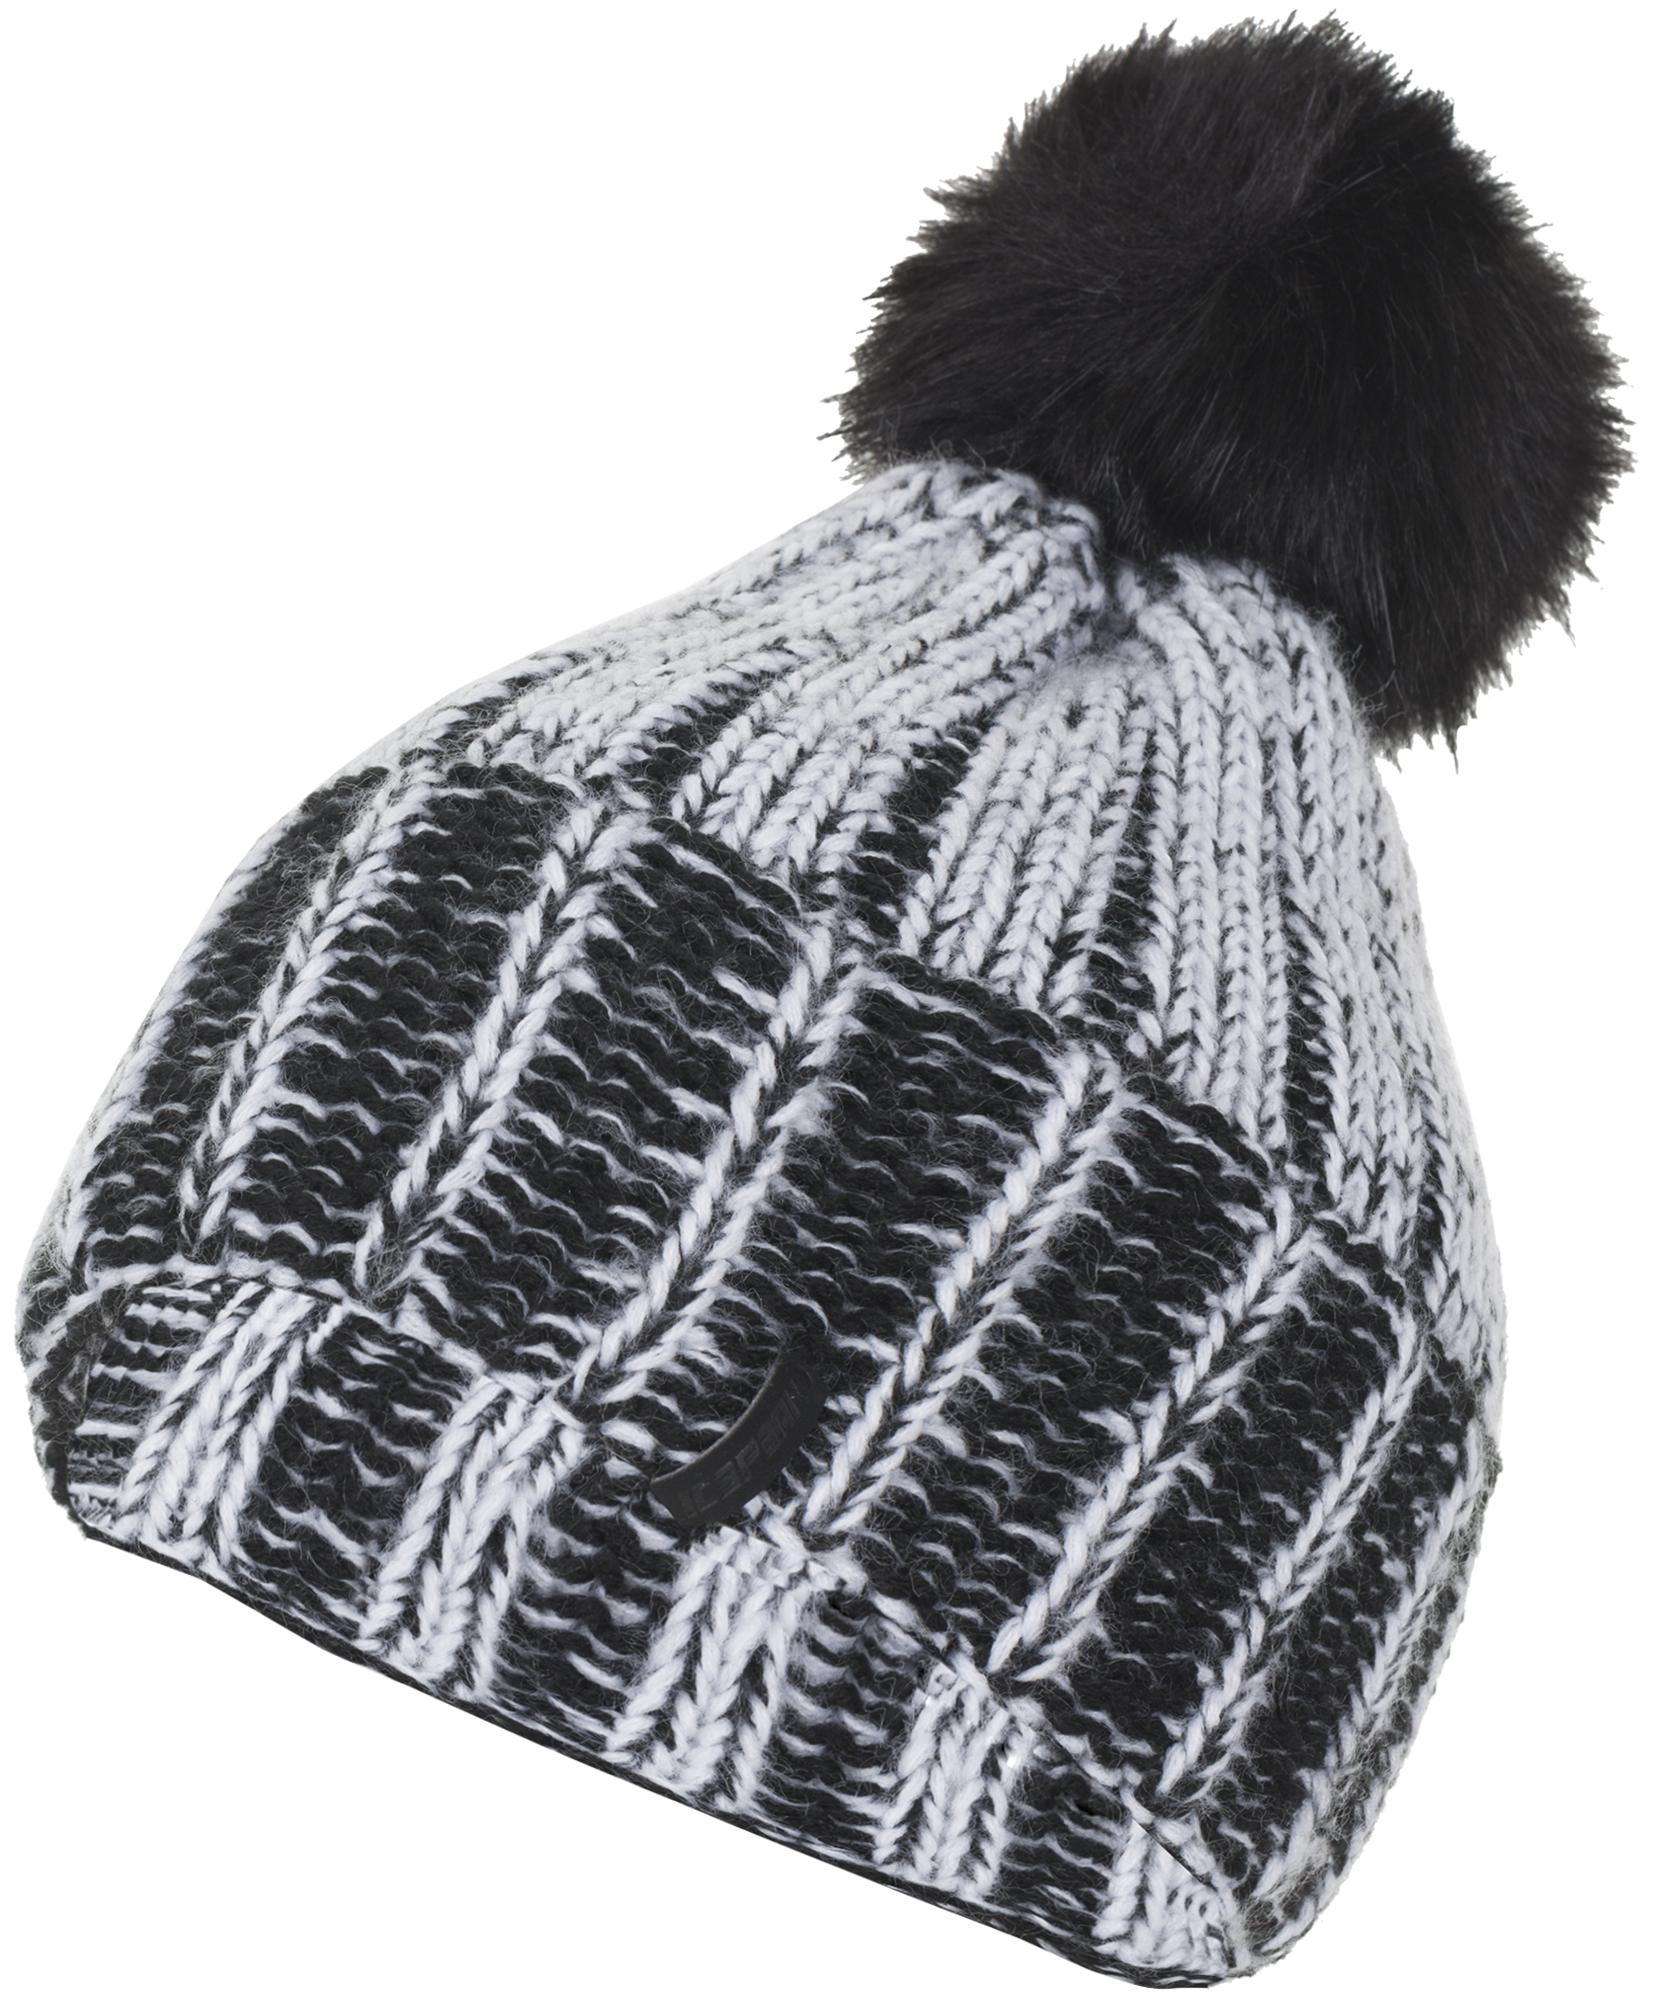 IcePeak Шапка женская IcePeak Ilene, размер Без размера icepeak шапка для девочек icepeak lito размер без размера